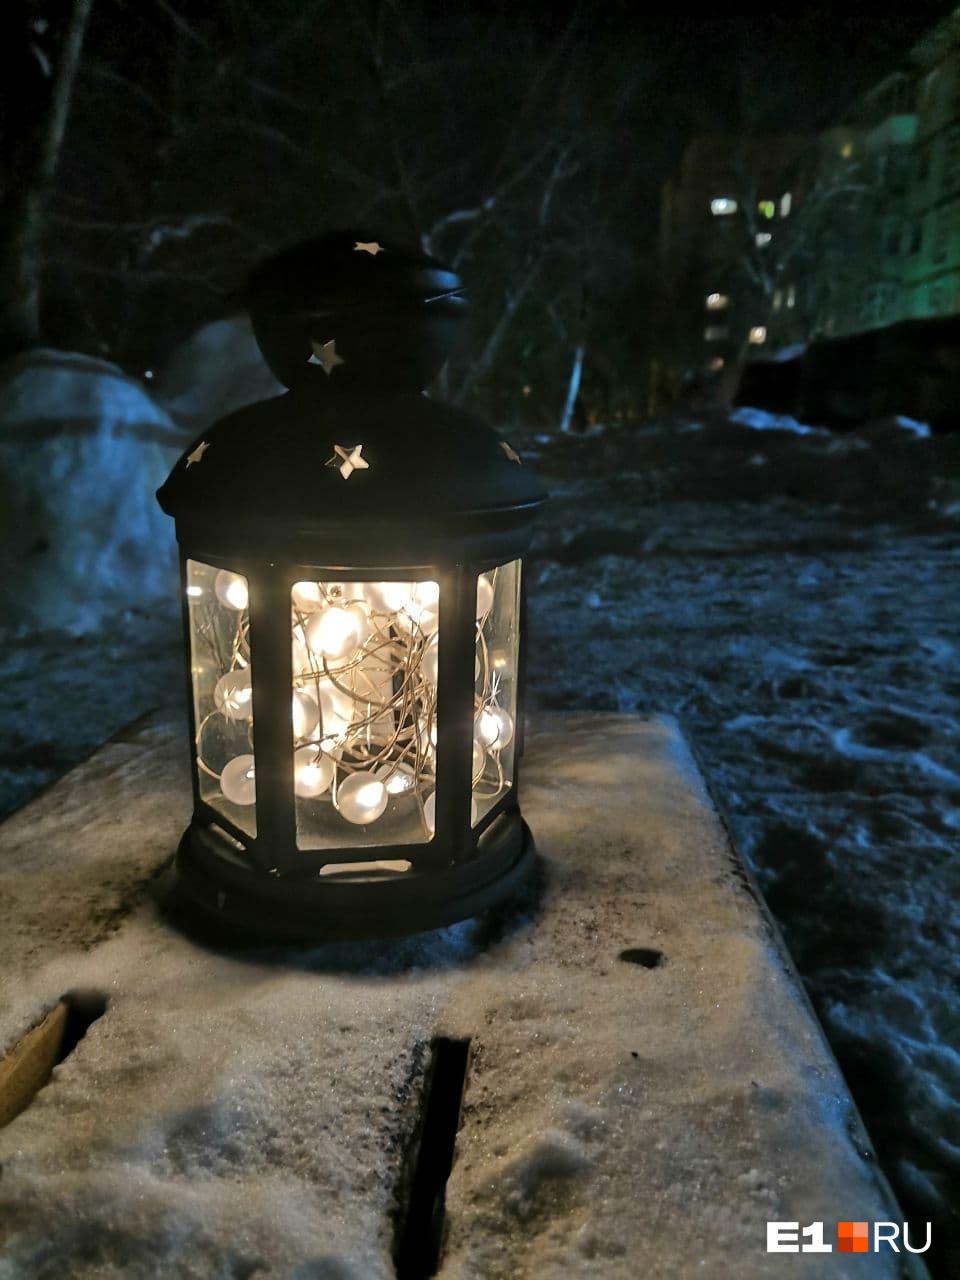 А с таким красивым фонариком во двор вышла наша читательница Надежда